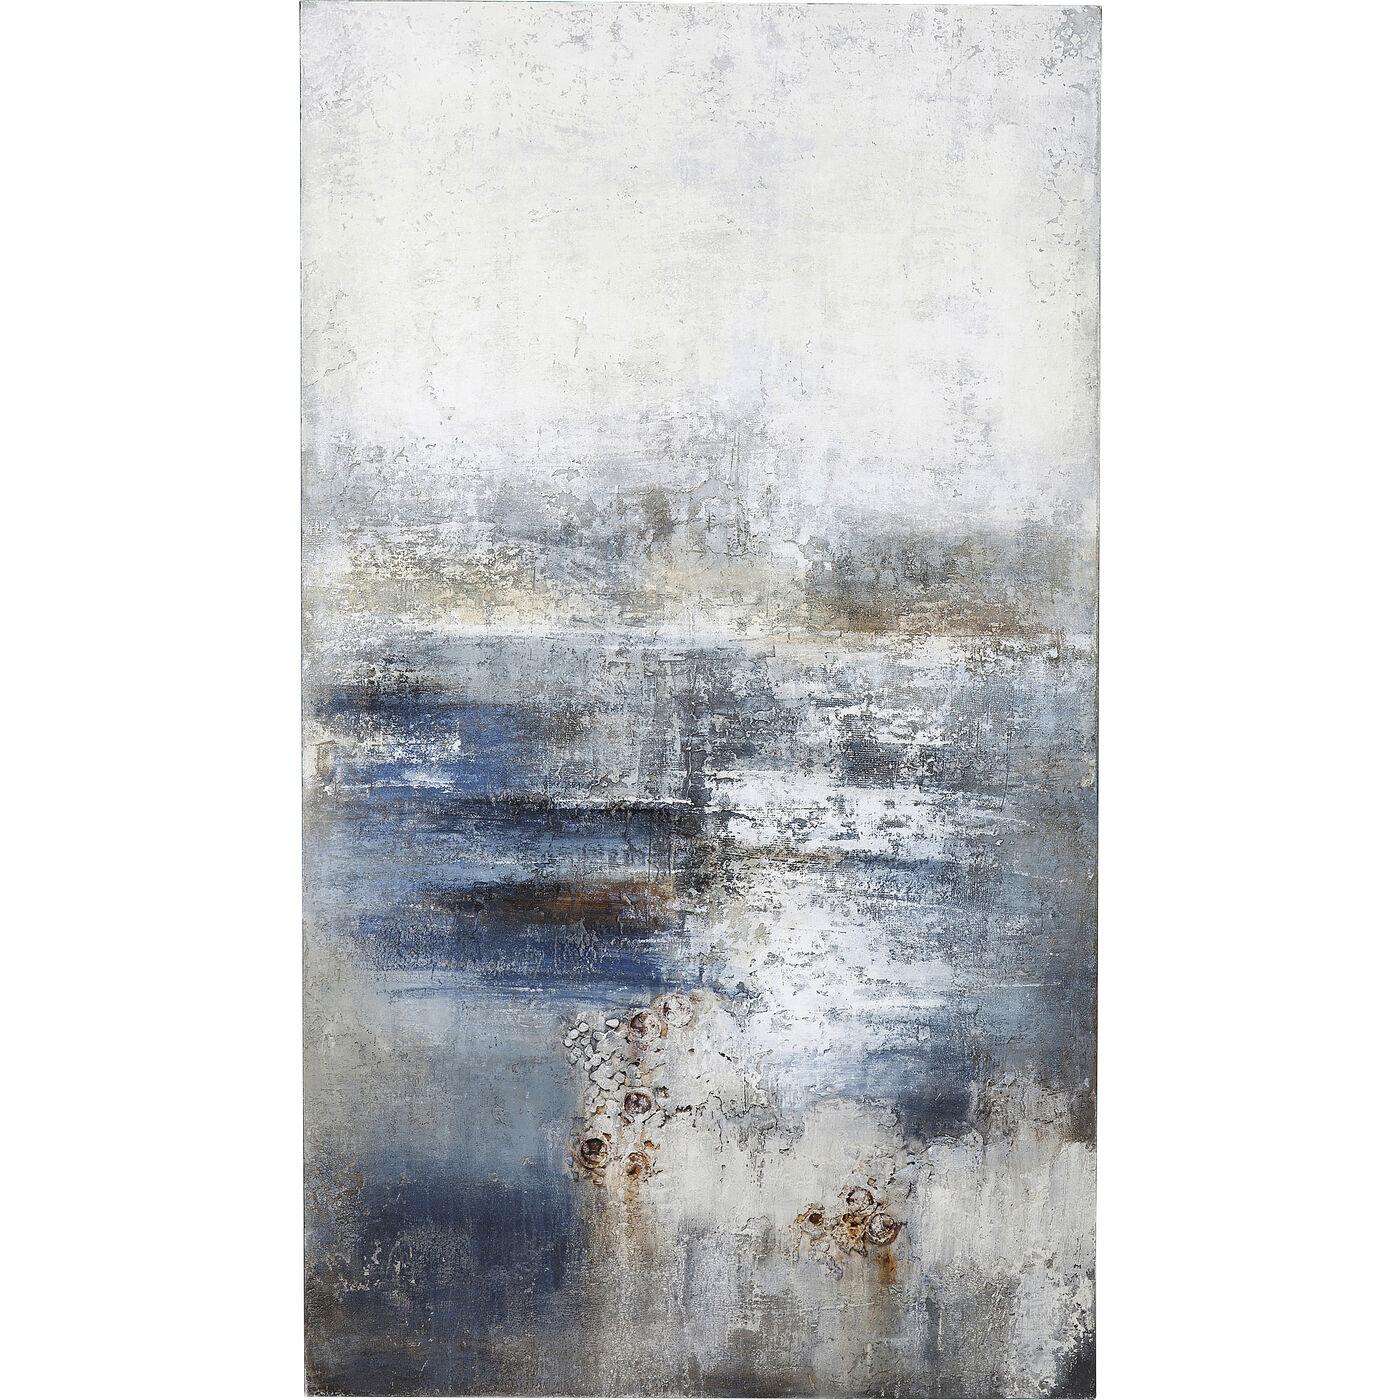 Acrylbild Abstract Into The Night 210x120